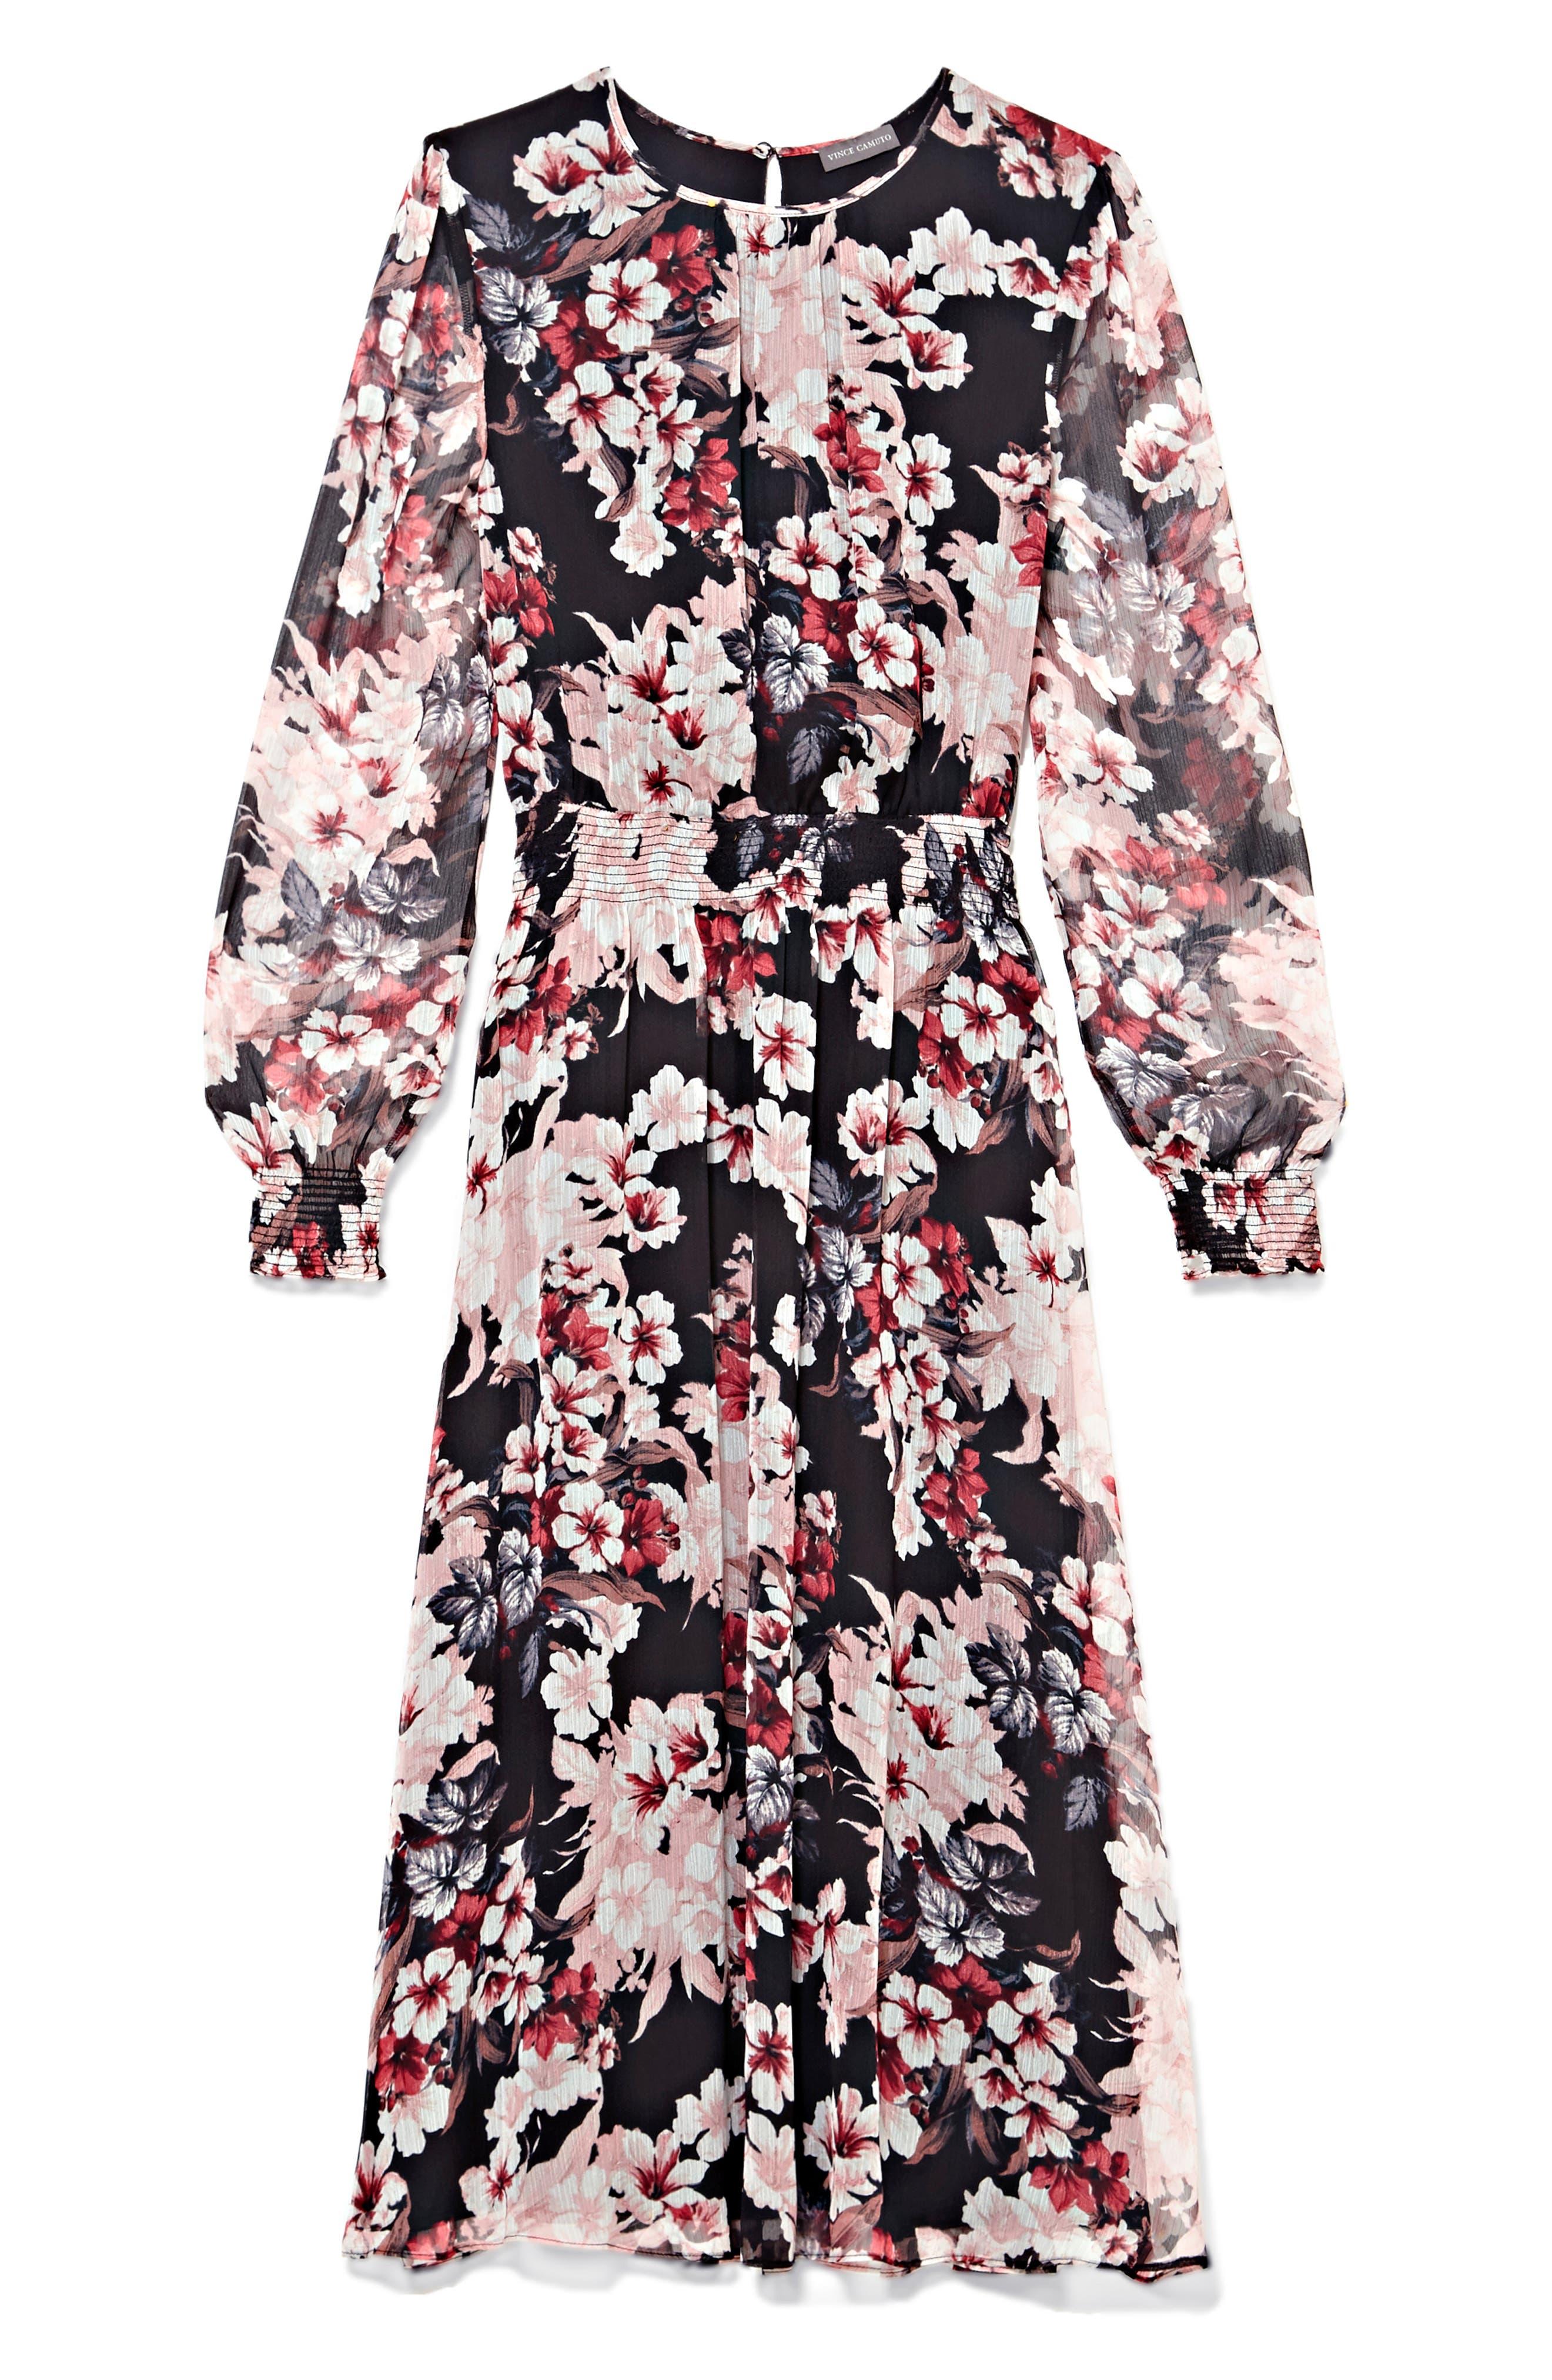 VINCE CAMUTO,                             Timeless Blooms Cinch Waist Midi Dress,                             Alternate thumbnail 3, color,                             006